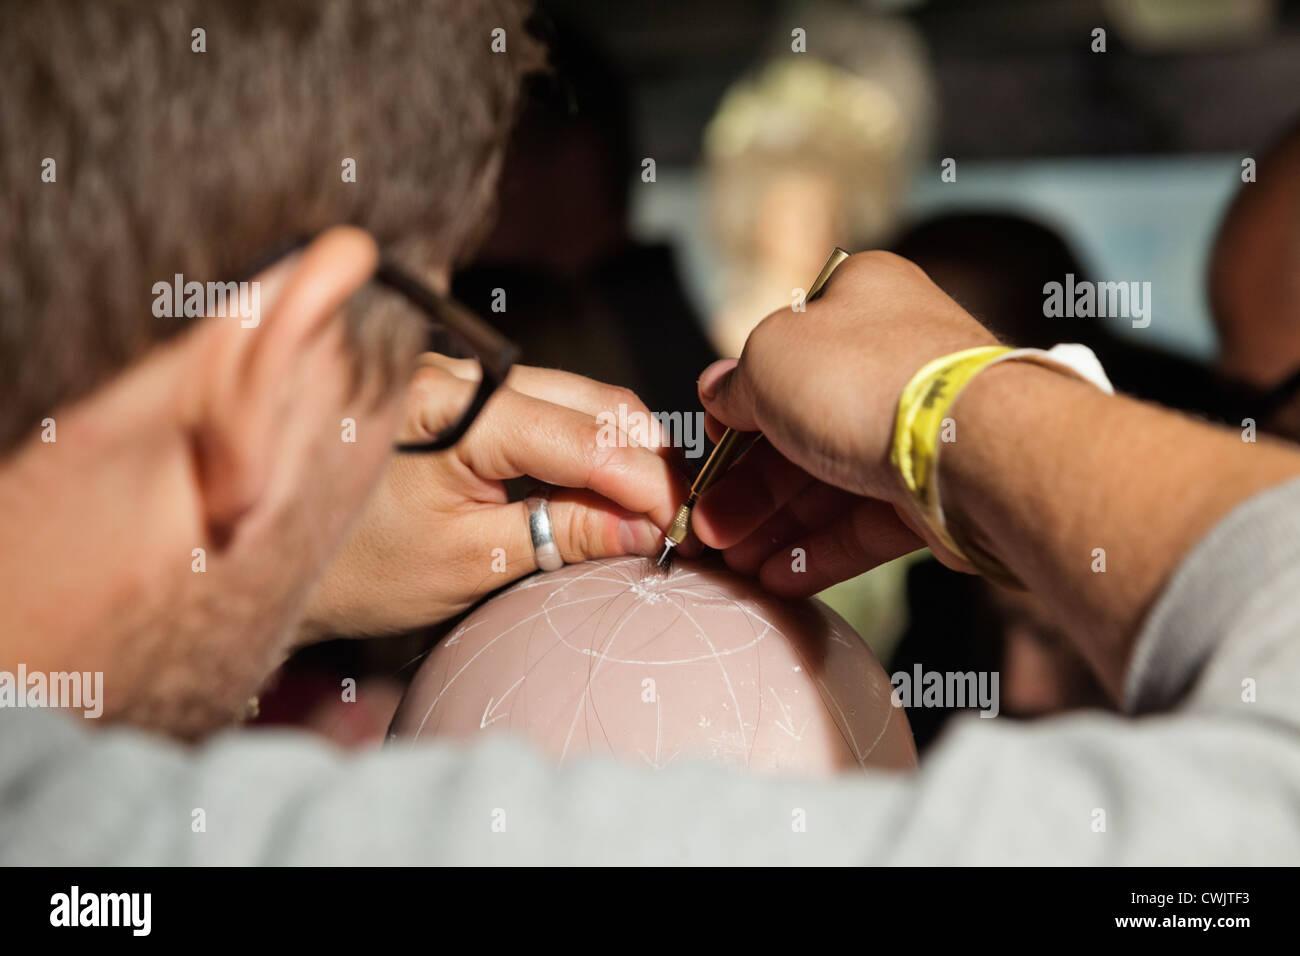 England, London, Madame Tussauds, Demonstration of Implanting Hair into Waxwork Head - Stock Image